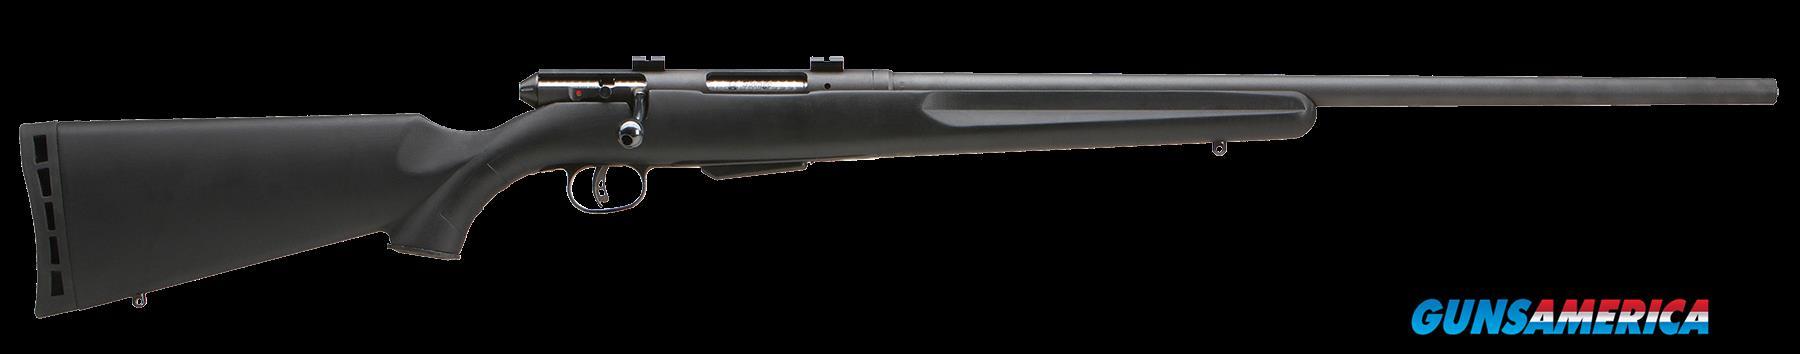 Savage 25, Sav 19740 25wv         17hor  Guns > Pistols > 1911 Pistol Copies (non-Colt)